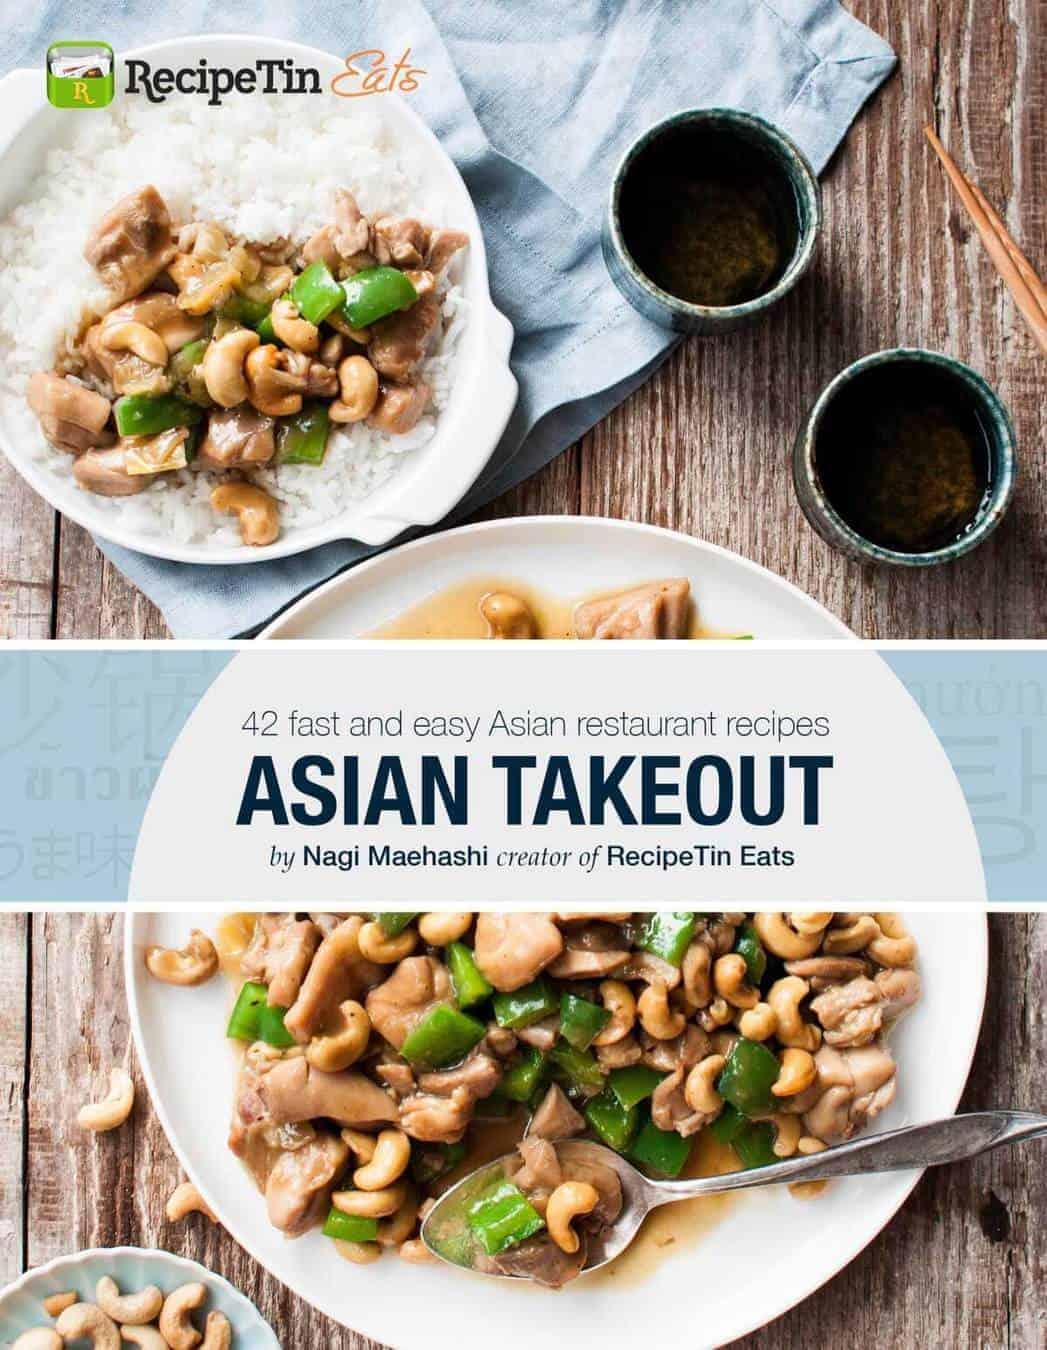 Free Asian Takeout eCookbook | RecipeTin Eats www.recipetineats.com